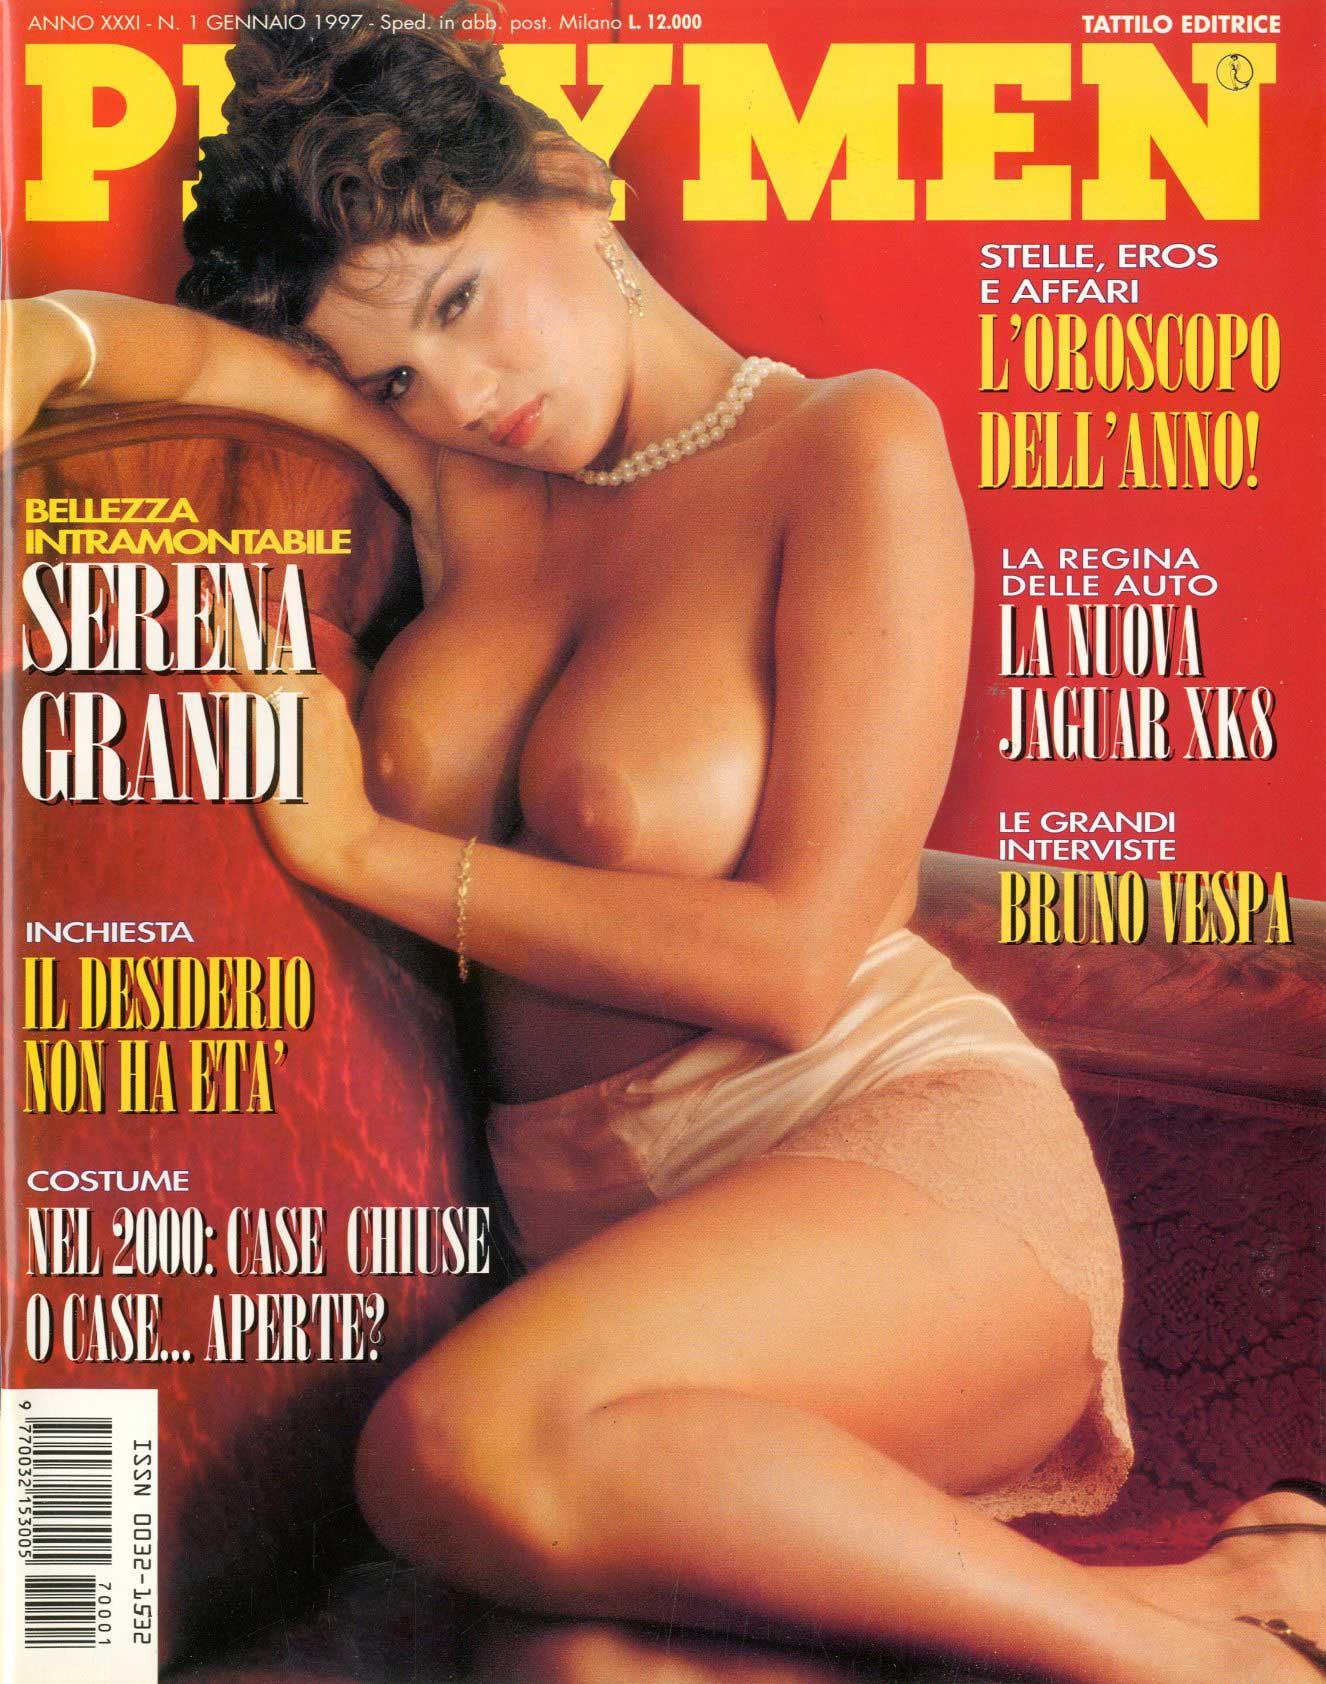 Maria bellucci 23 santo domingo connection - 4 4